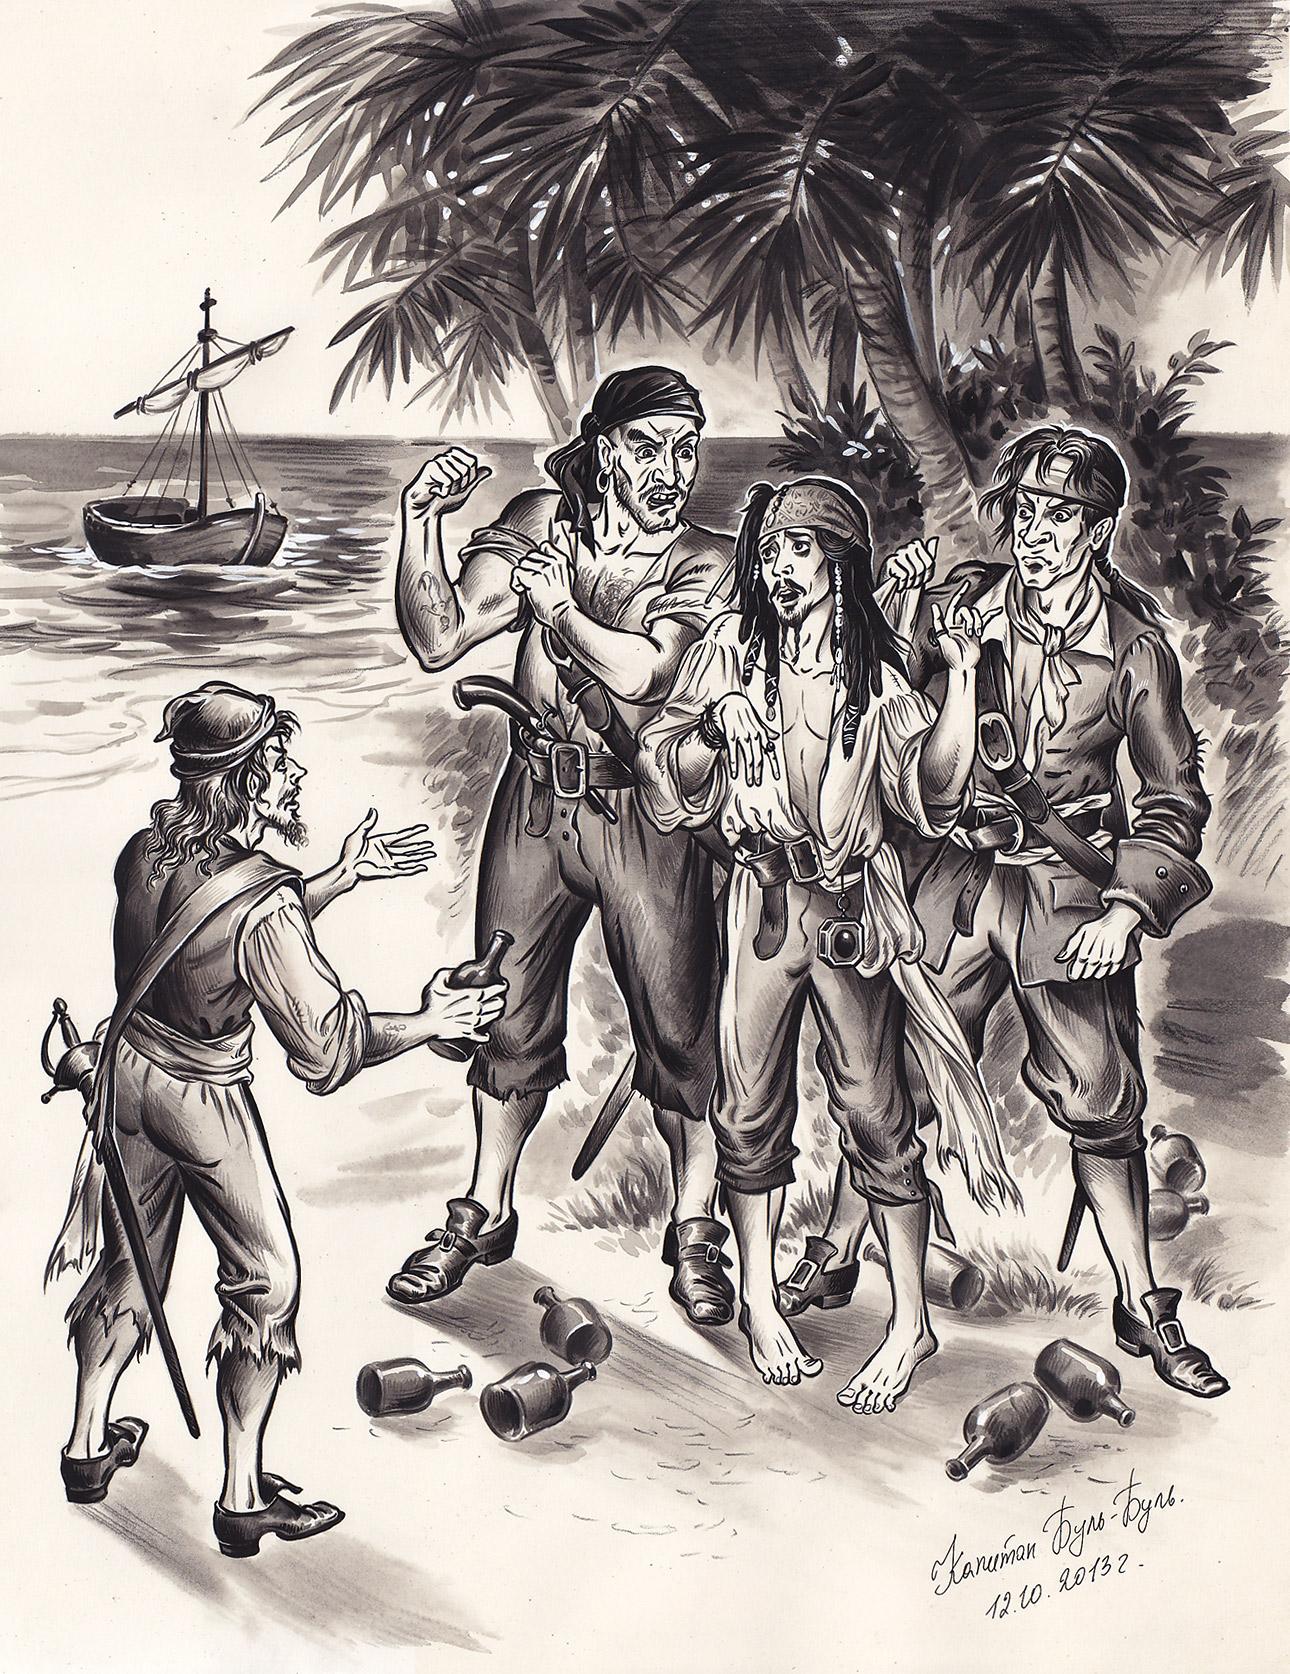 On the isle 2 by Bormoglot